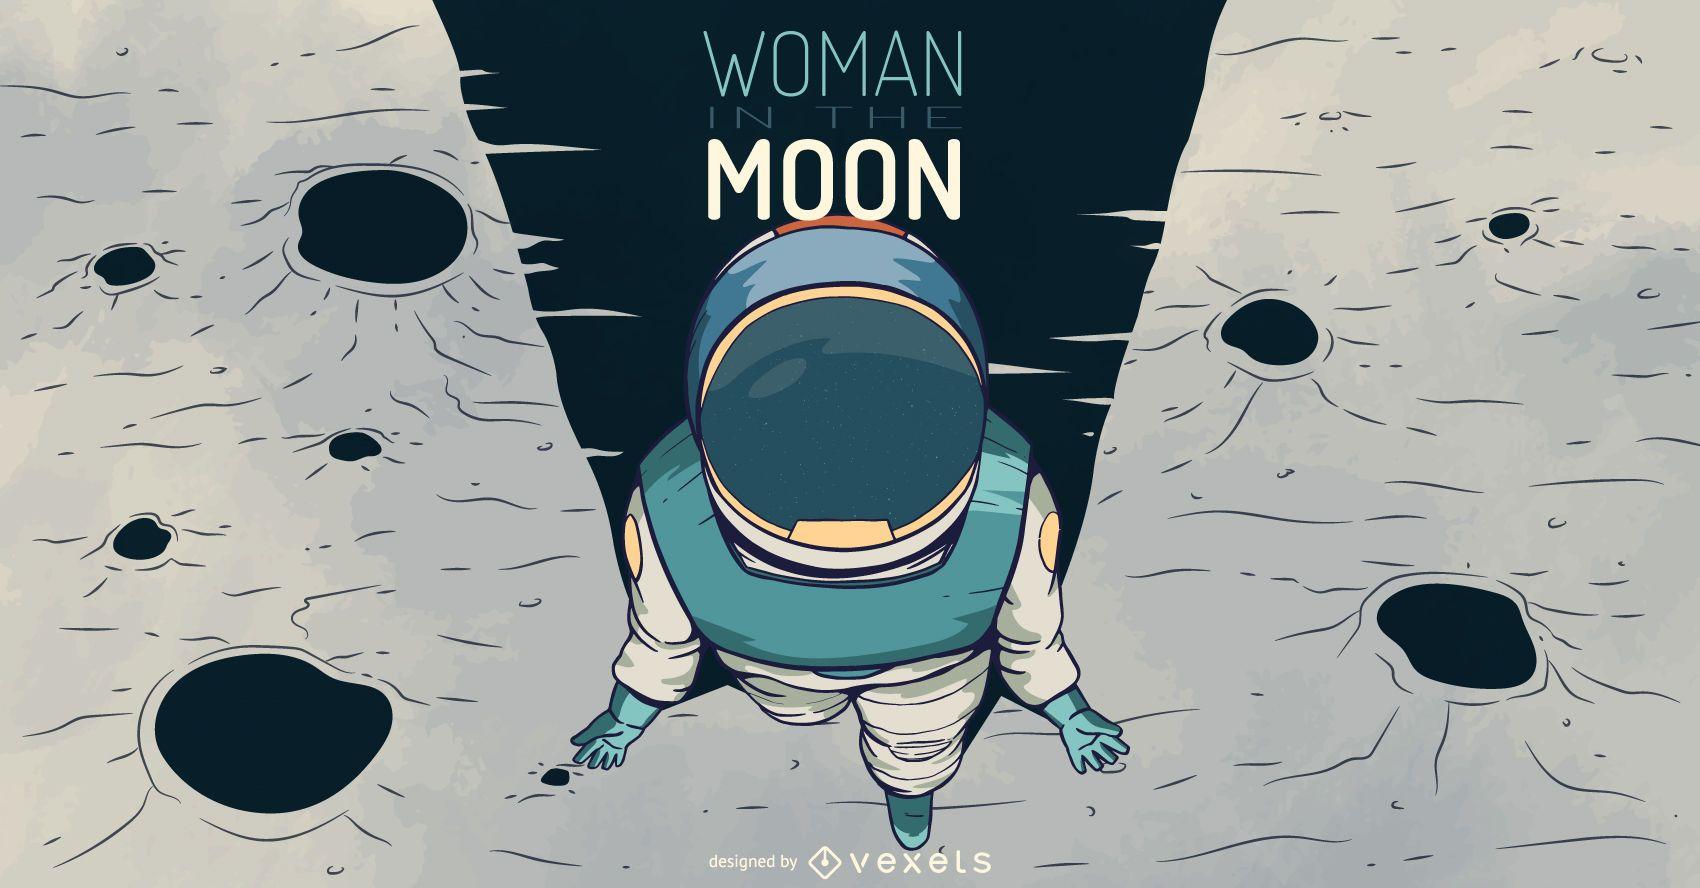 Ilustraci?n de mujer astronauta